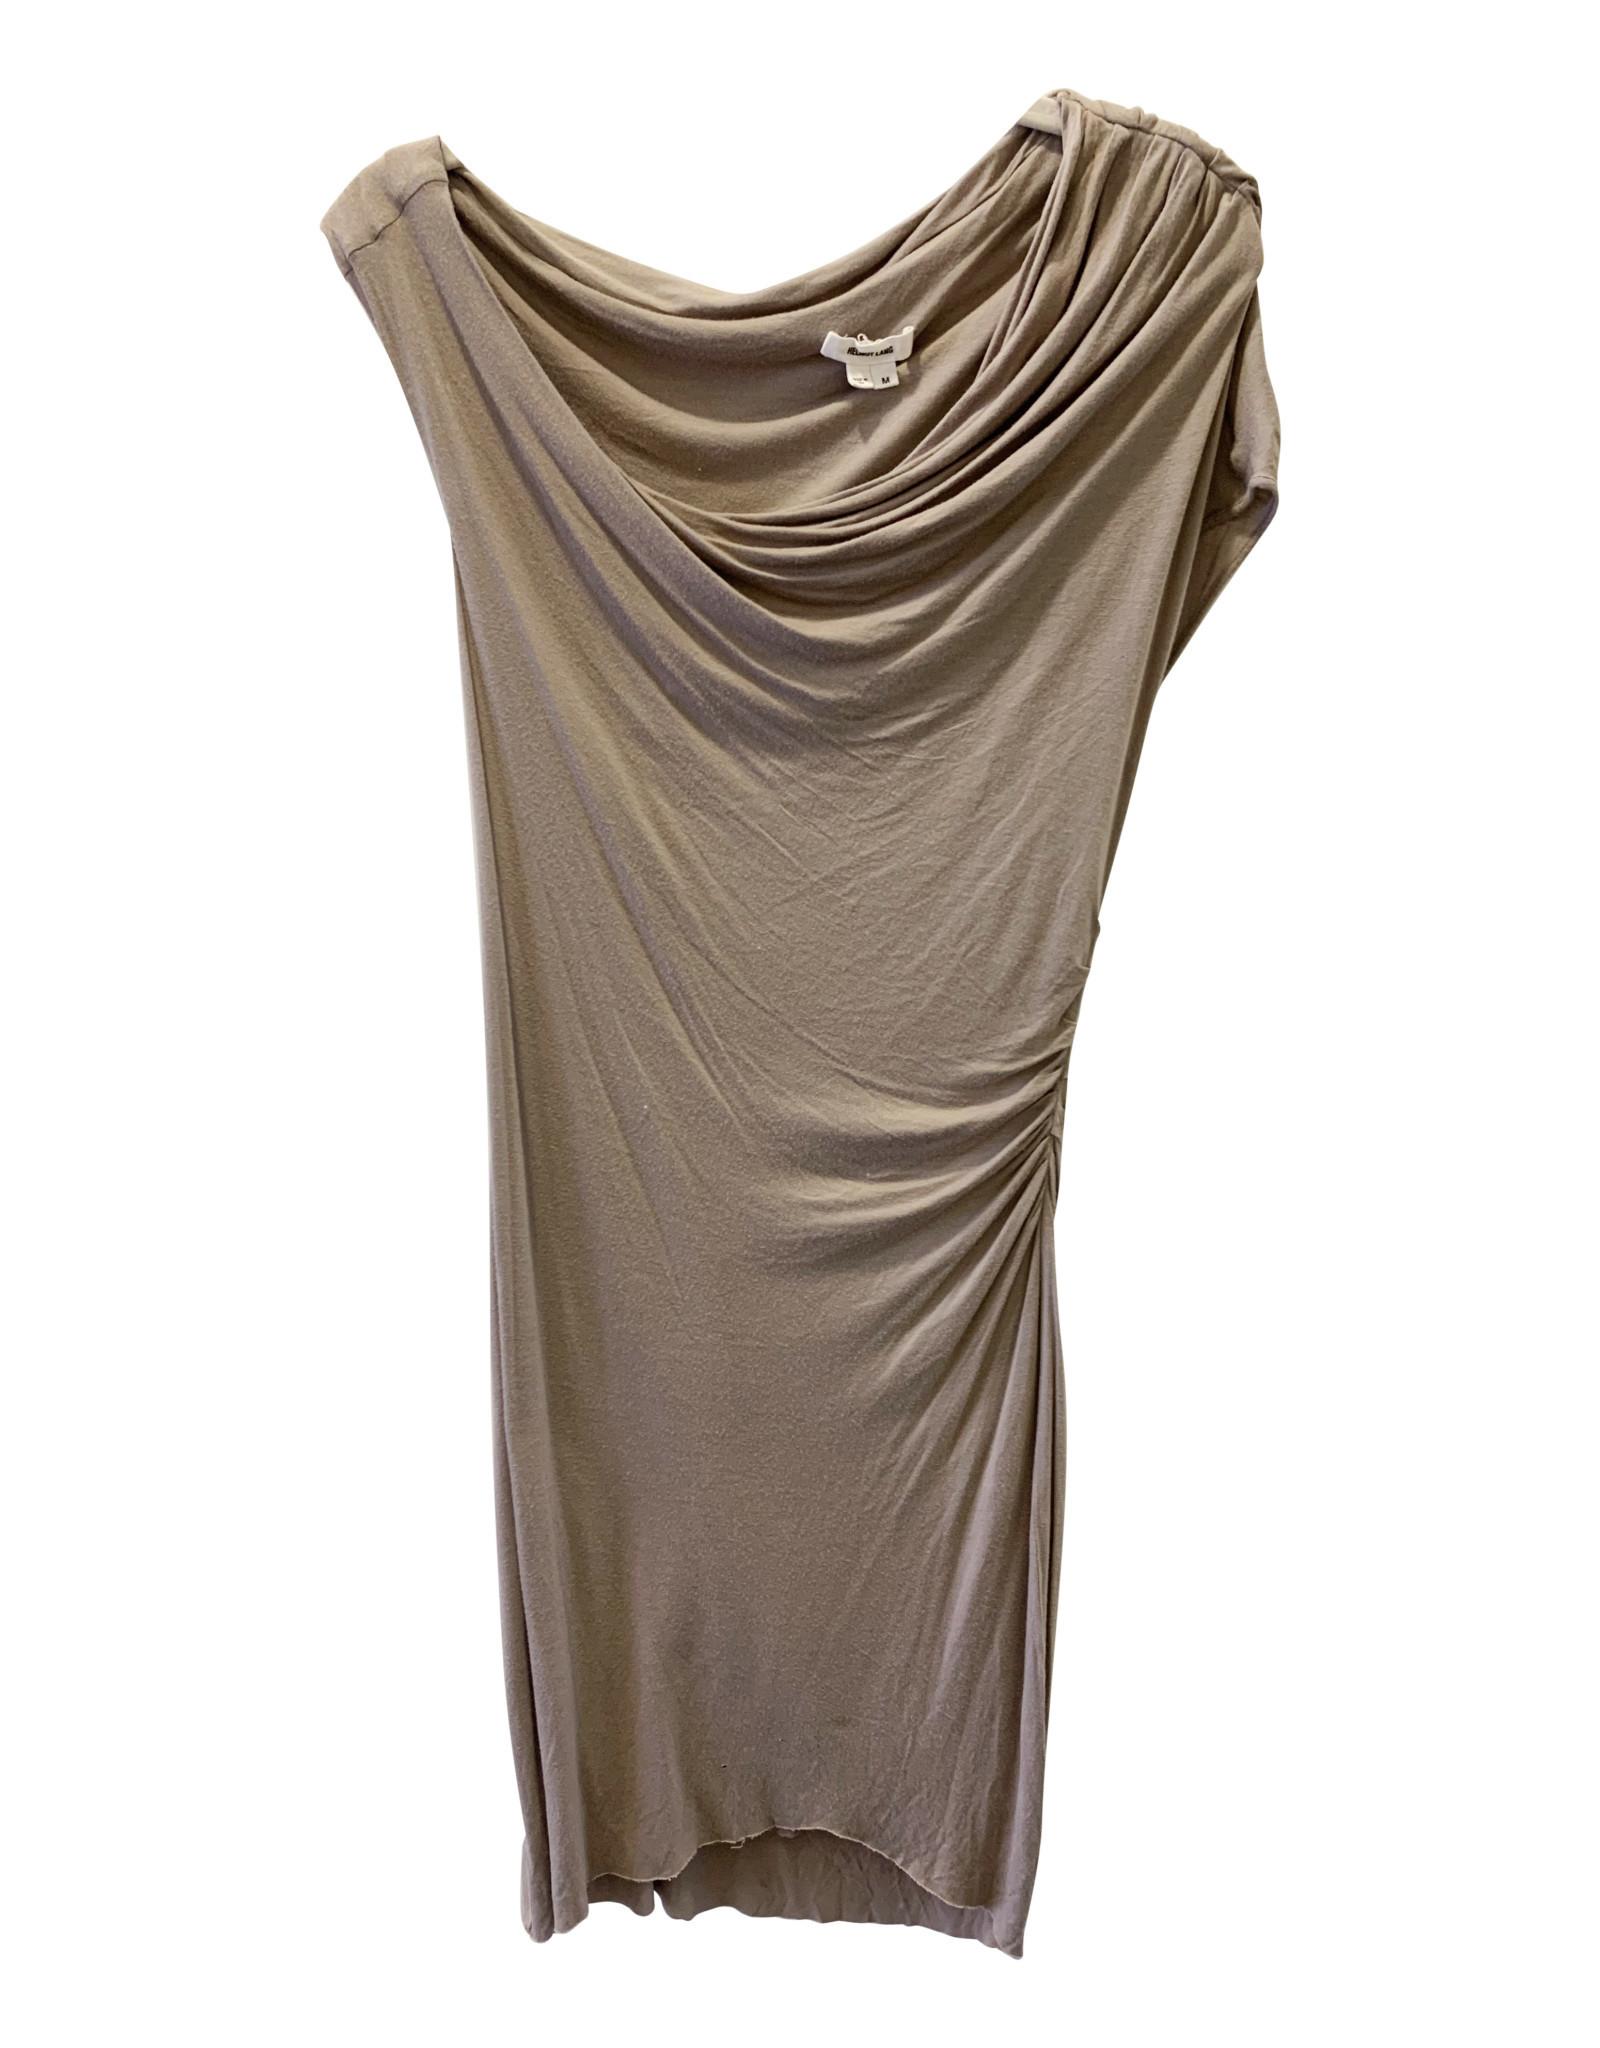 Wyld Blue Helmut Lang Cream Dress